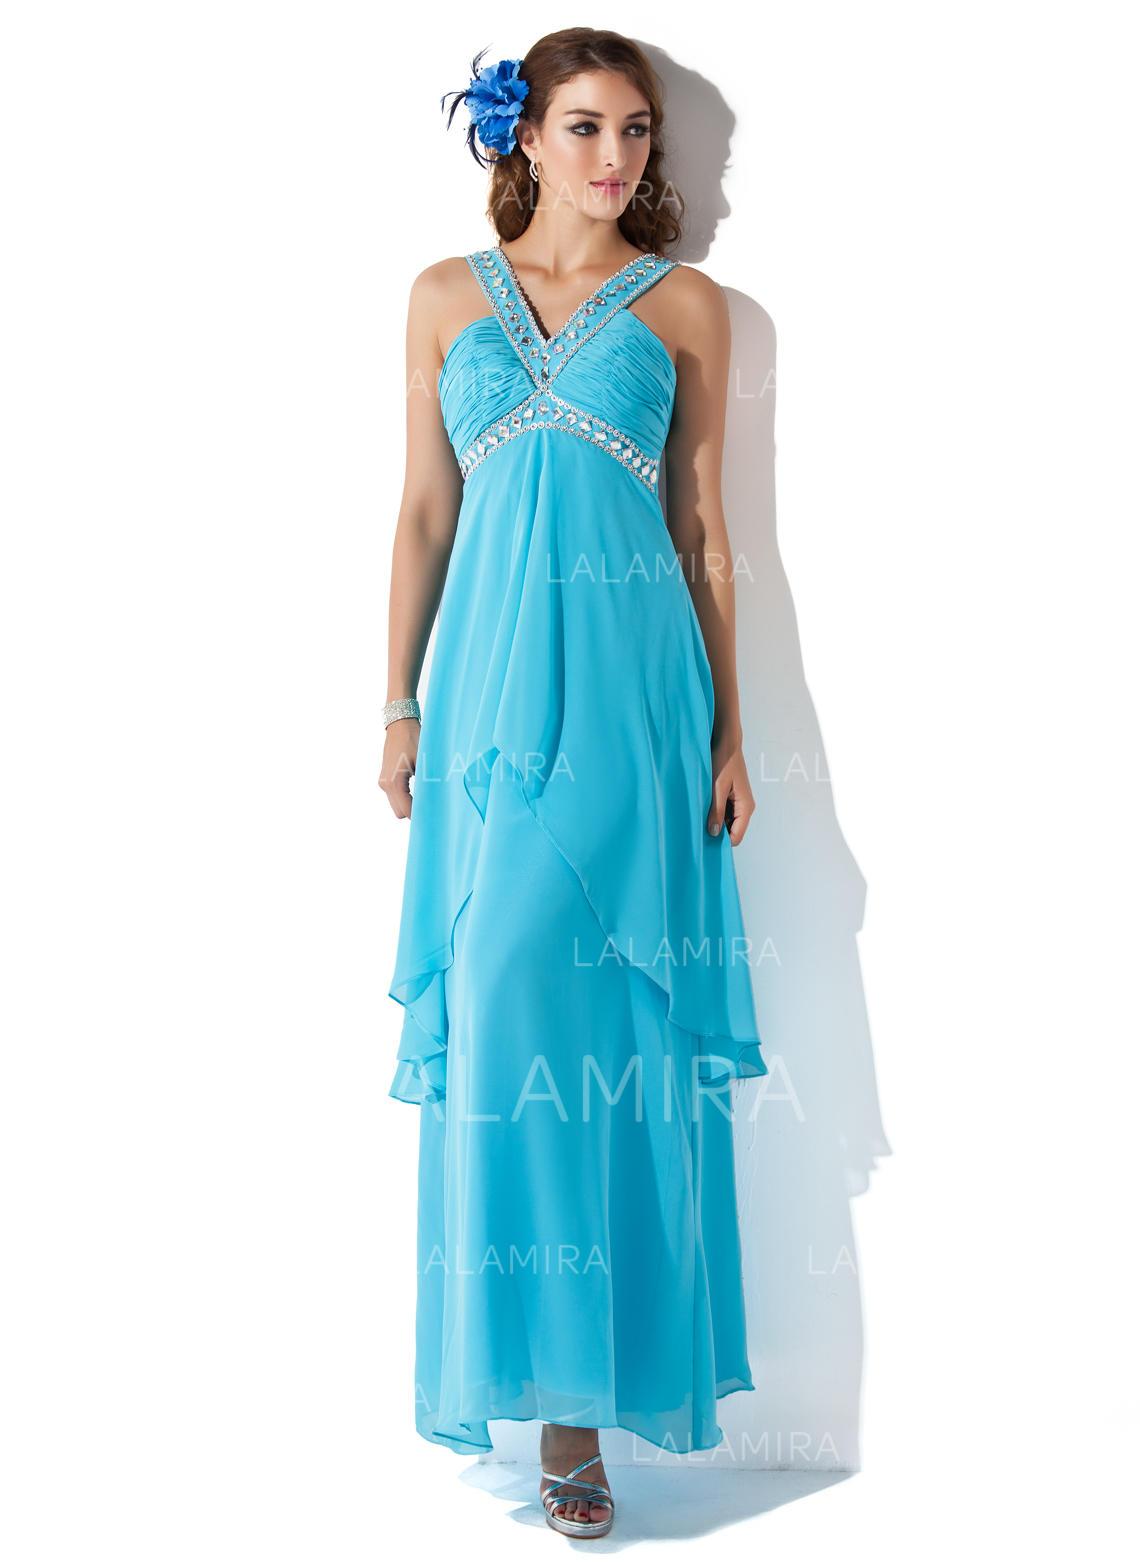 3463c8e5ae5 A-Line Princess Chiffon Prom Dresses Beading Cascading Ruffles V-neck  Sleeveless Ankle. Loading zoom